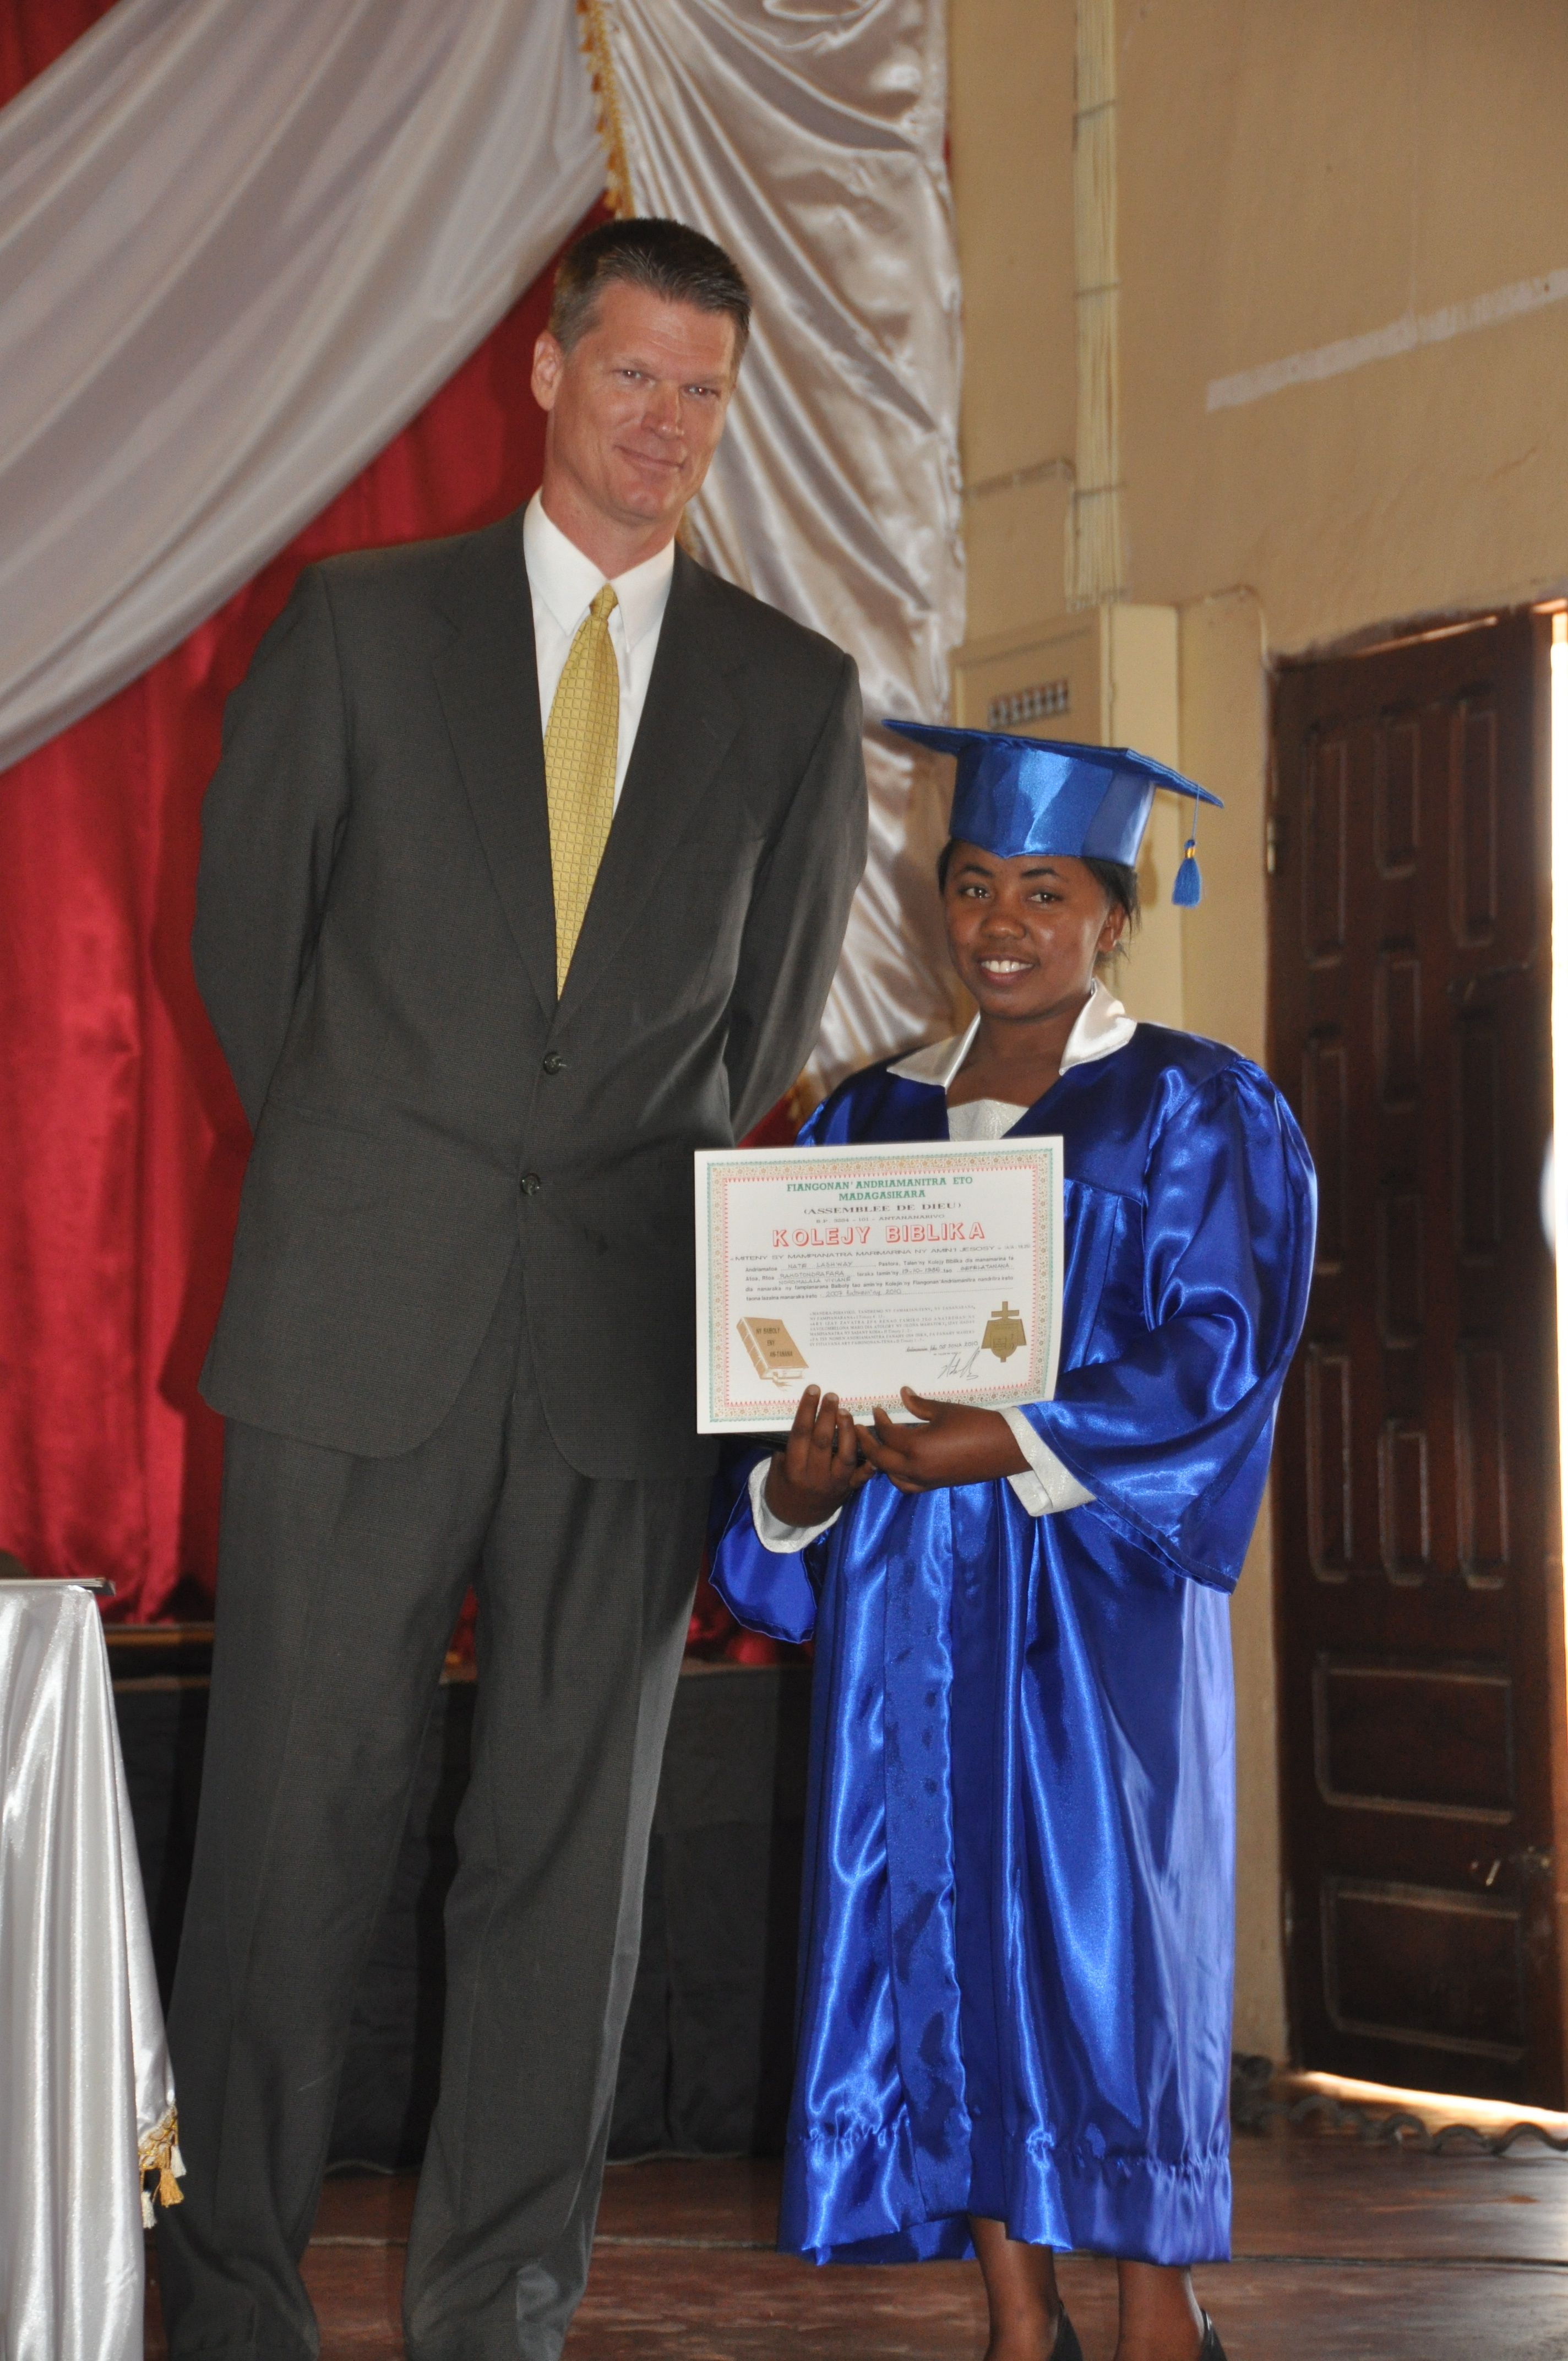 Bible School Graduation | Giant people, Tall people, Tall guys